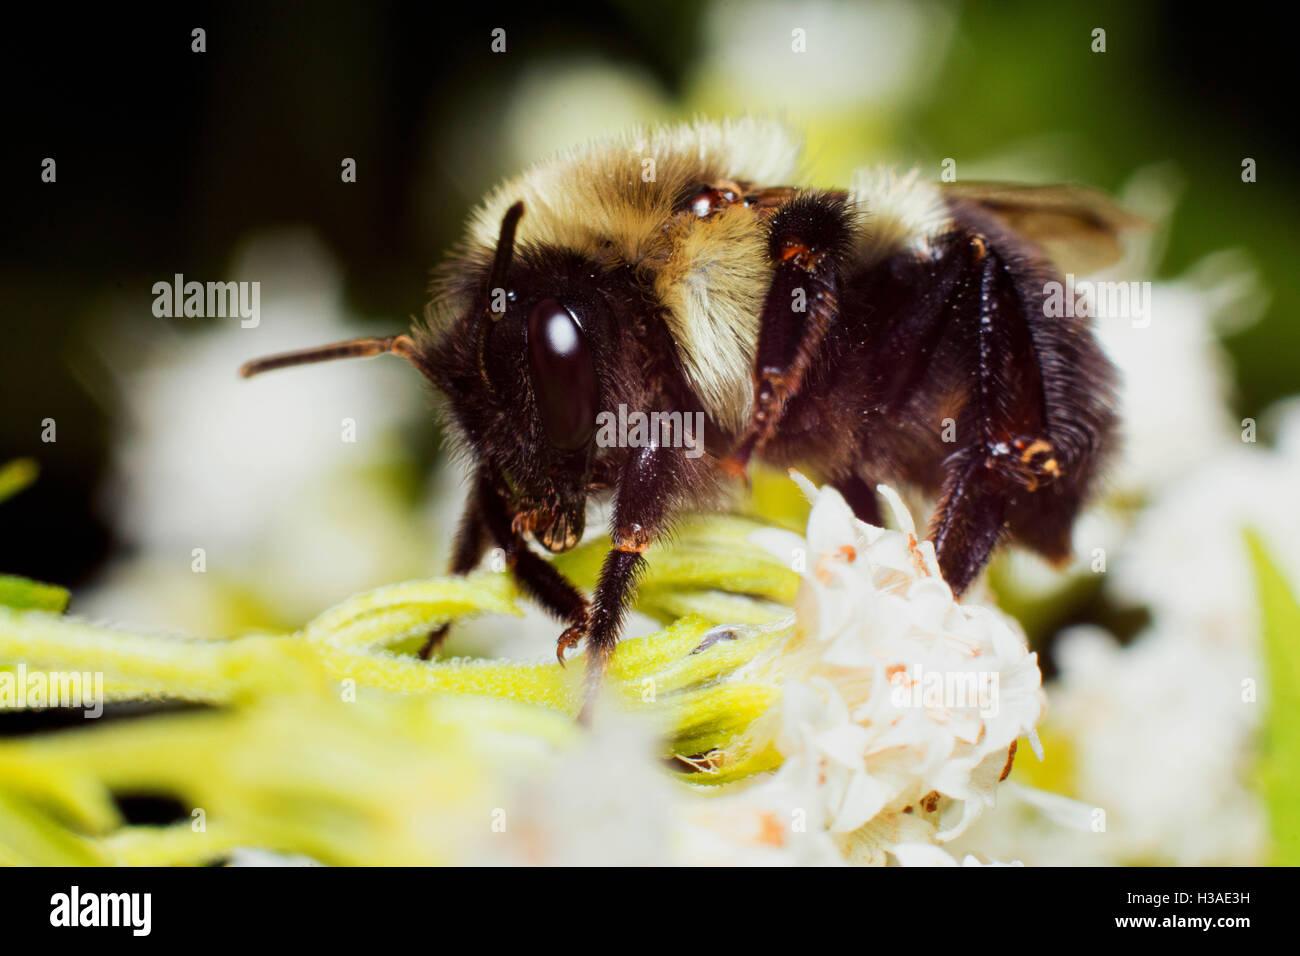 Bubmledore die Biene Stockbild